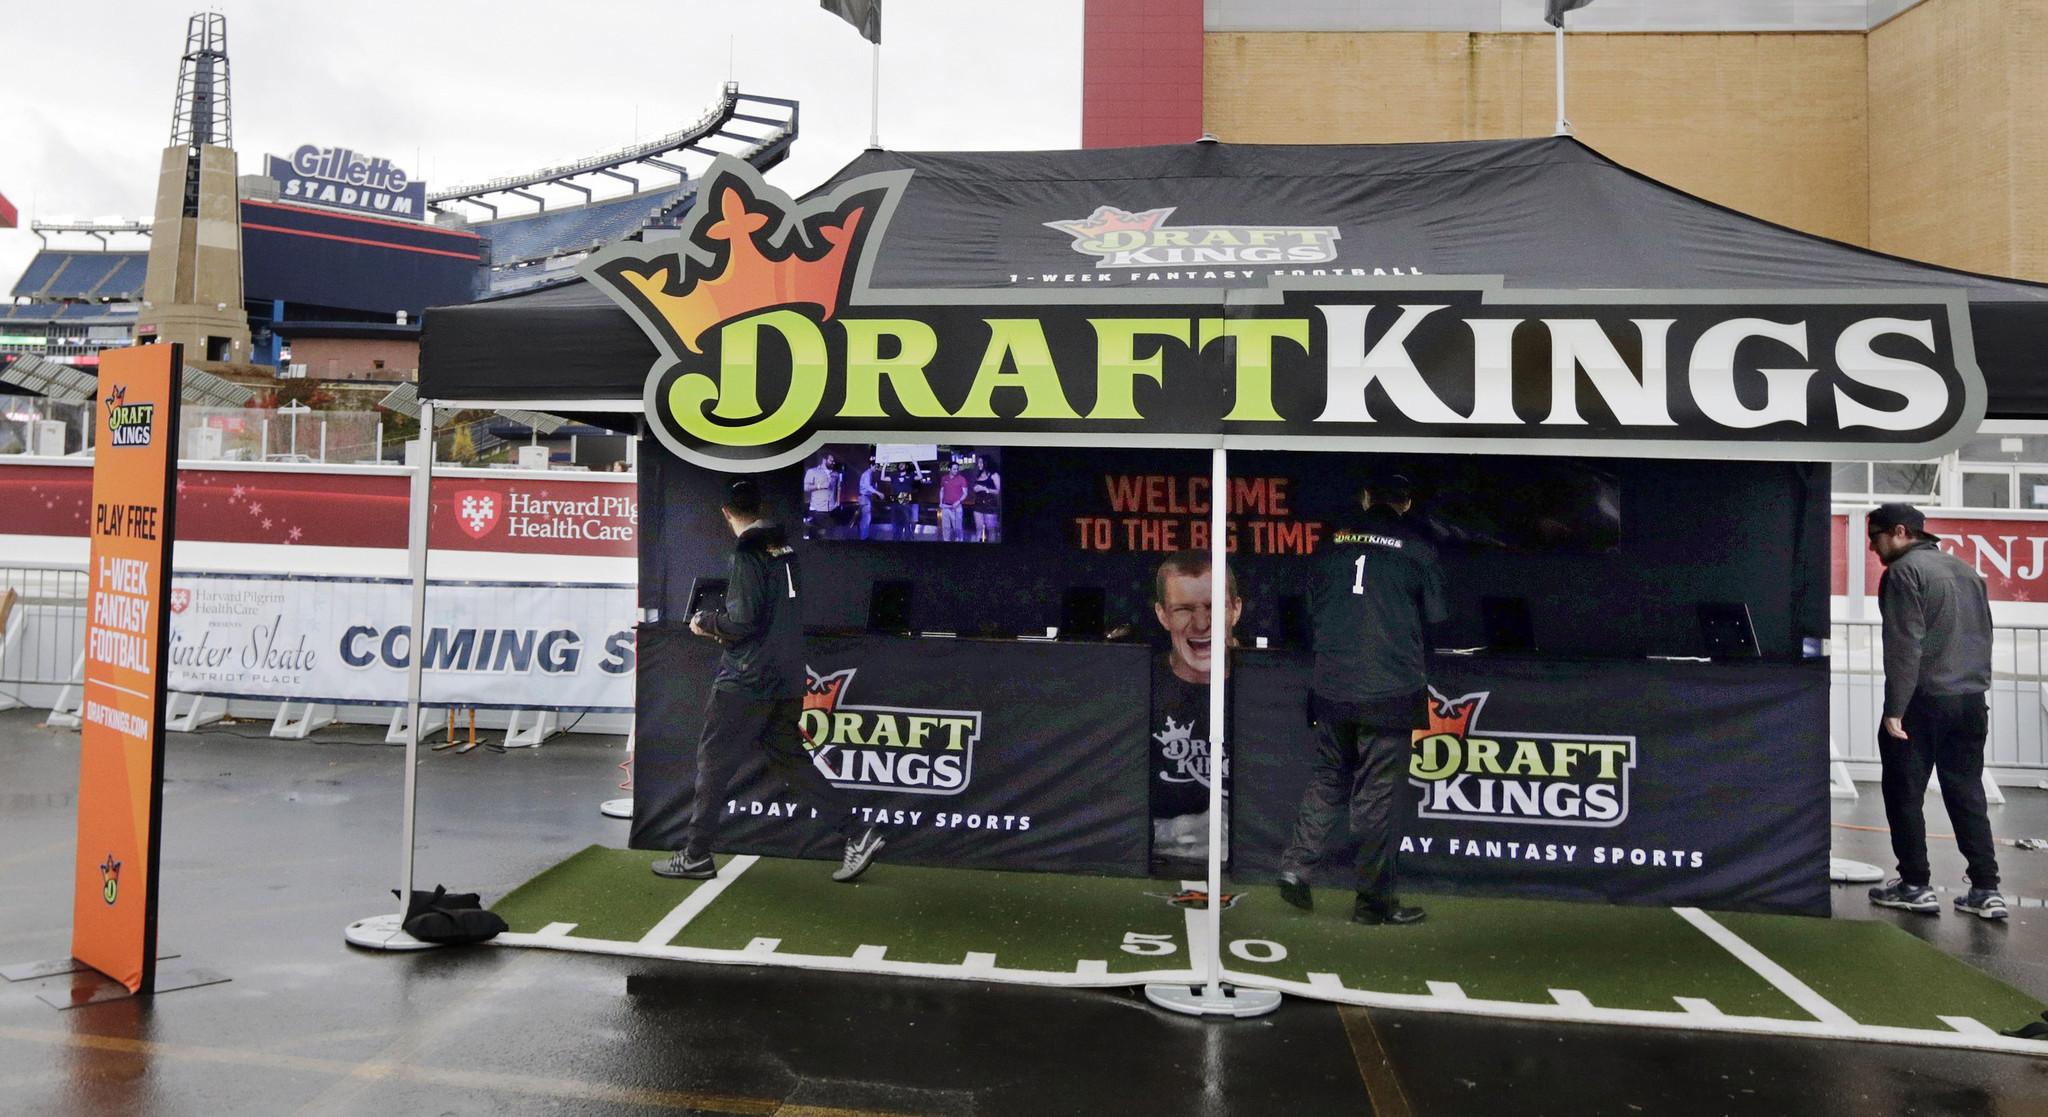 New york law state definition gambling fantasy football conrad treasury casino dress code